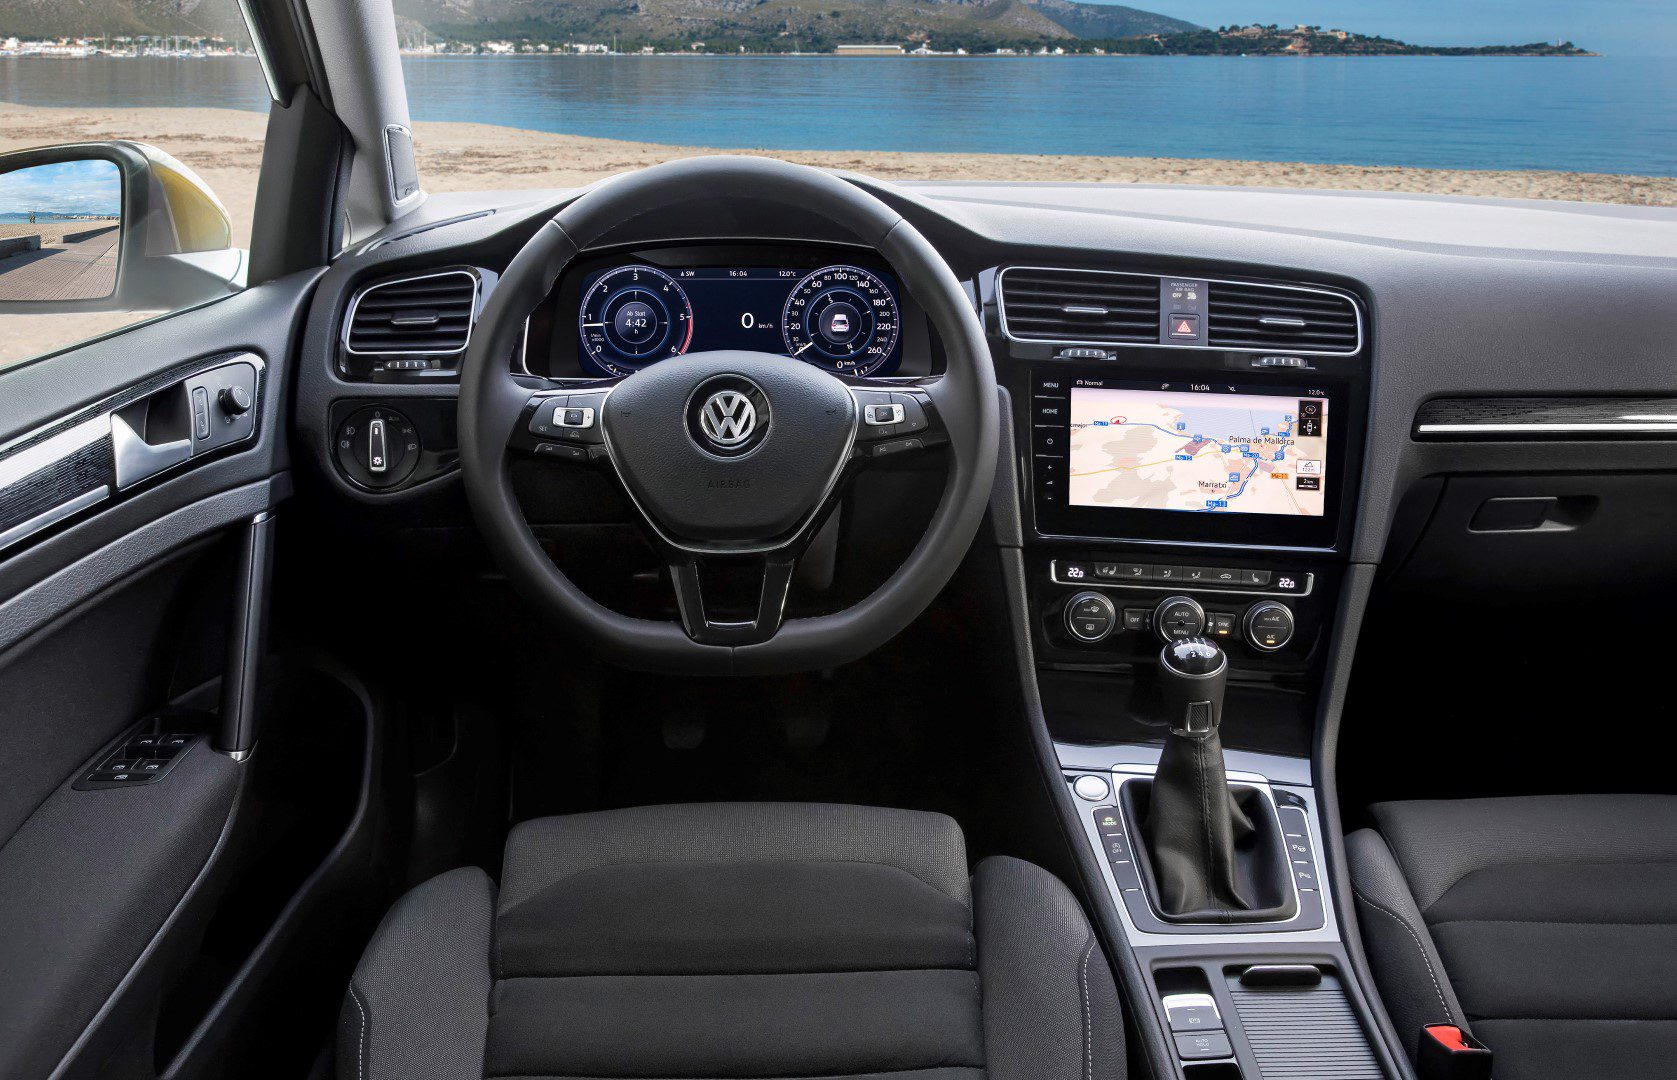 volkswagen golf nu leverbaar als business en business r. Black Bedroom Furniture Sets. Home Design Ideas